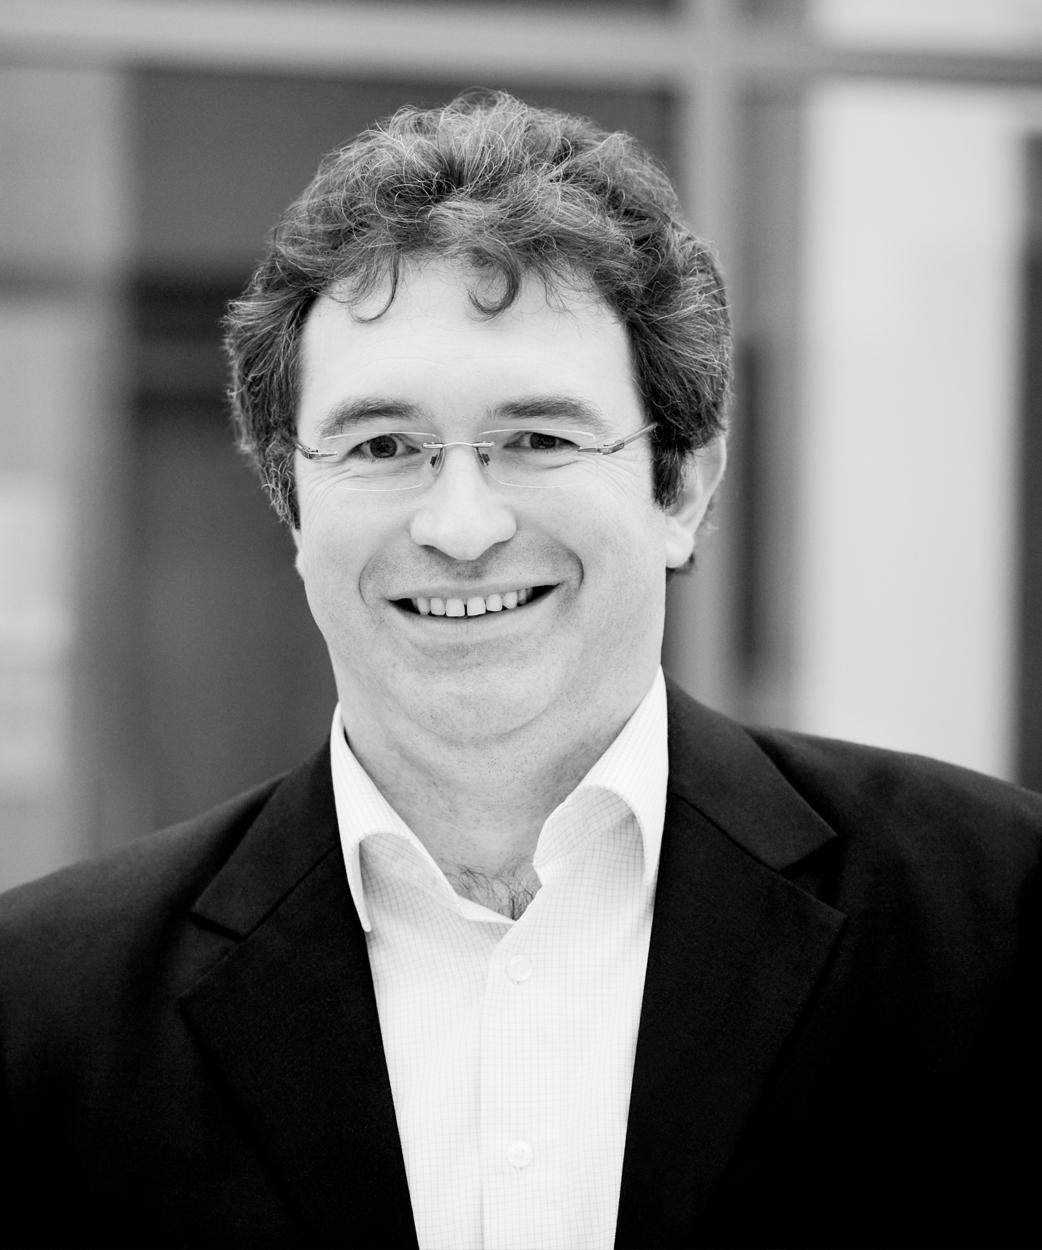 Jürgen Jähnert